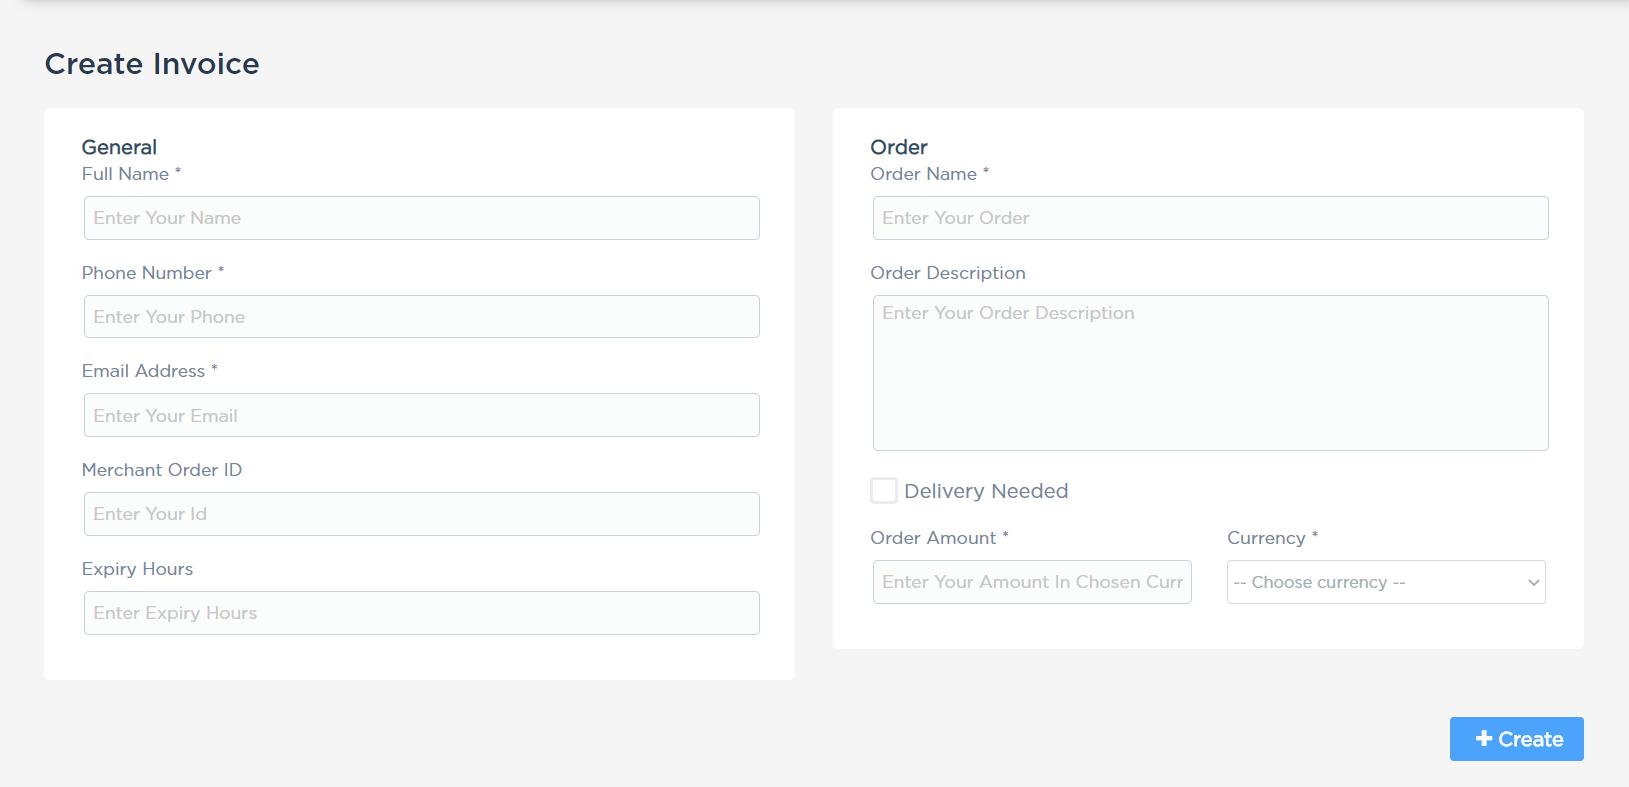 Accept Dashboard - Invoice tab.